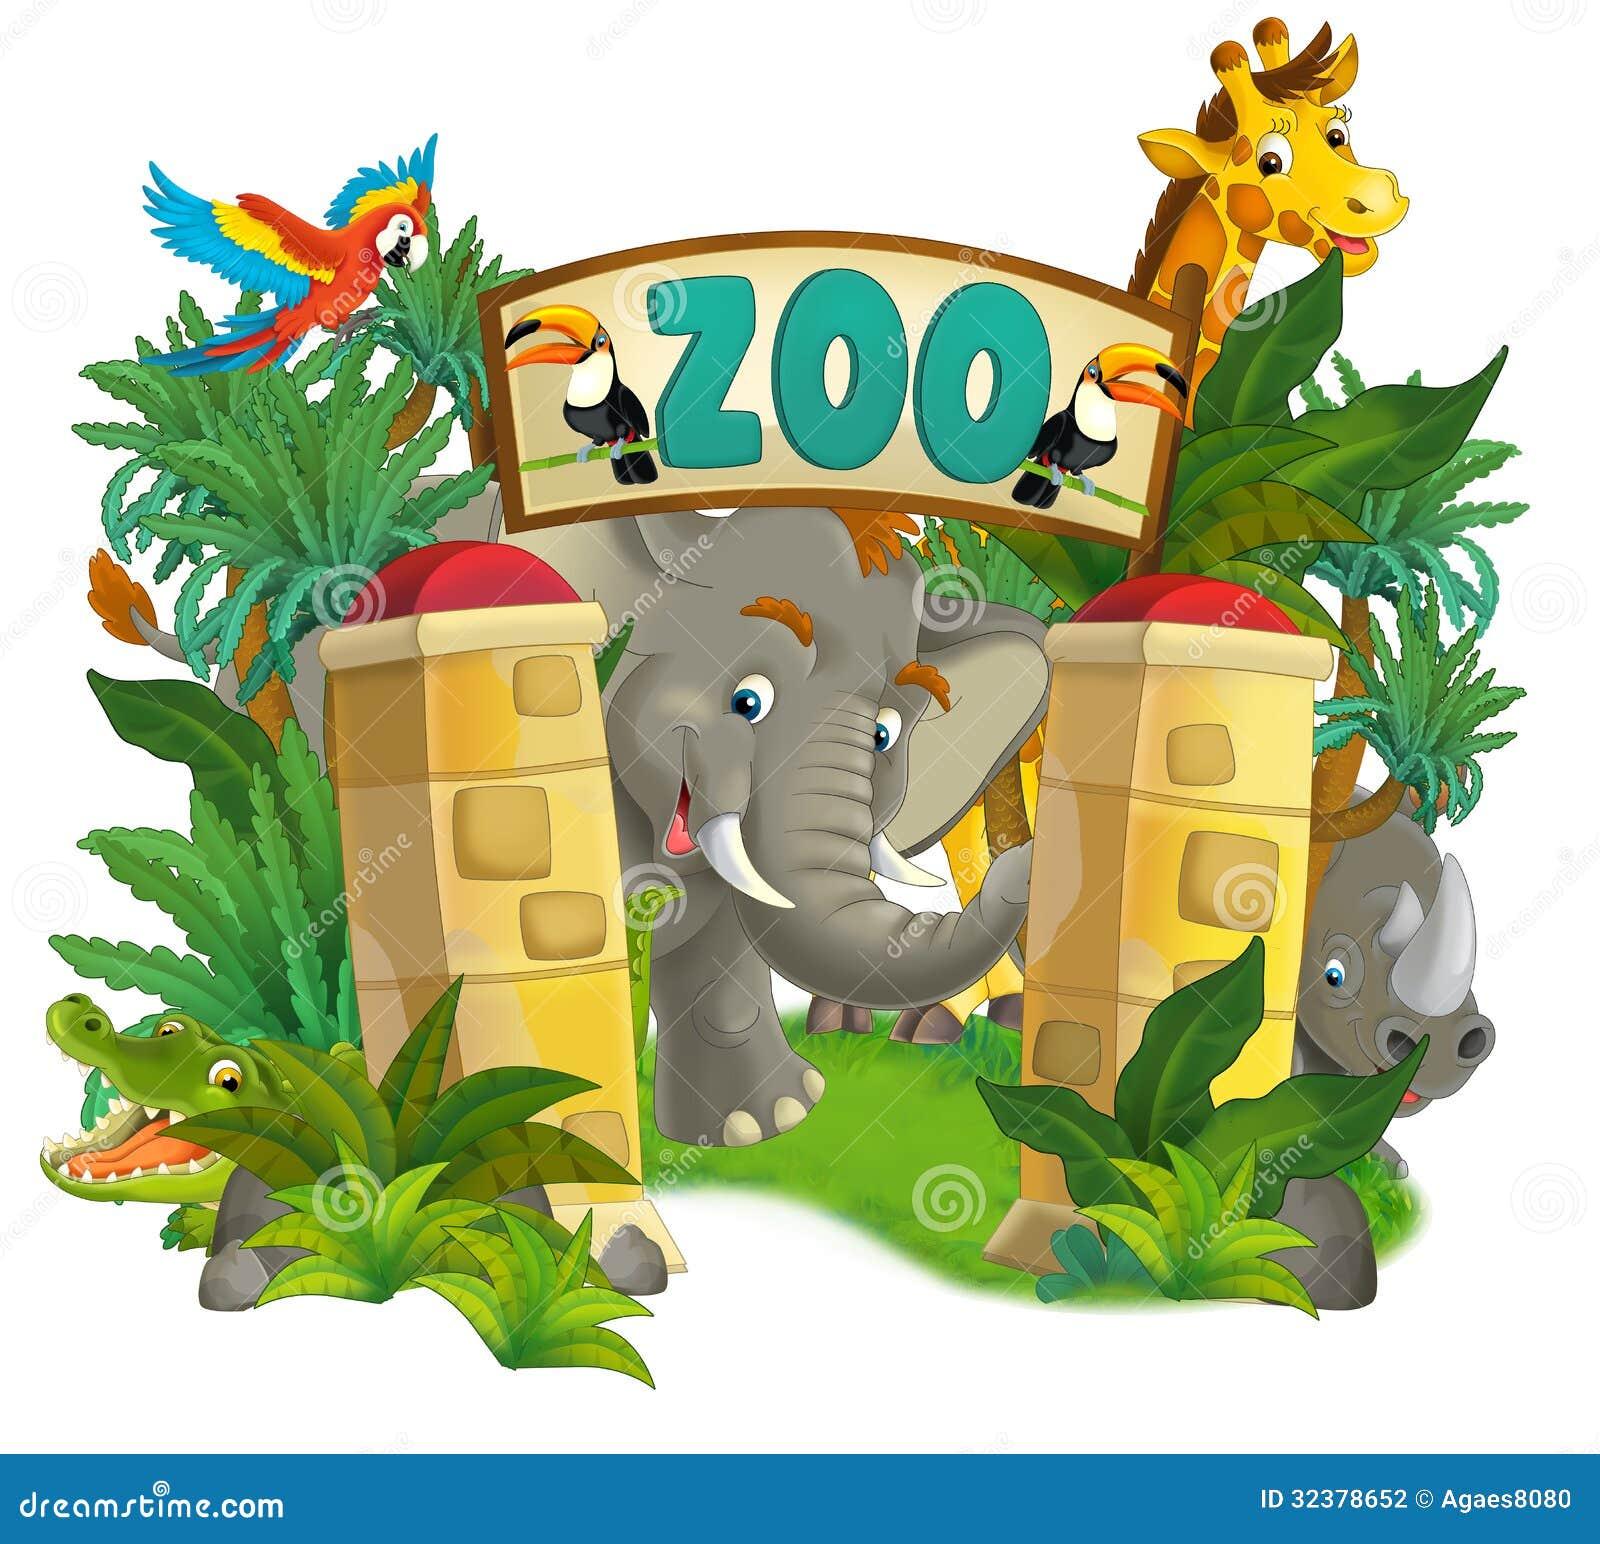 cartoon zoo amusement park illustration for the amusement park clipart png amusement park clipart free